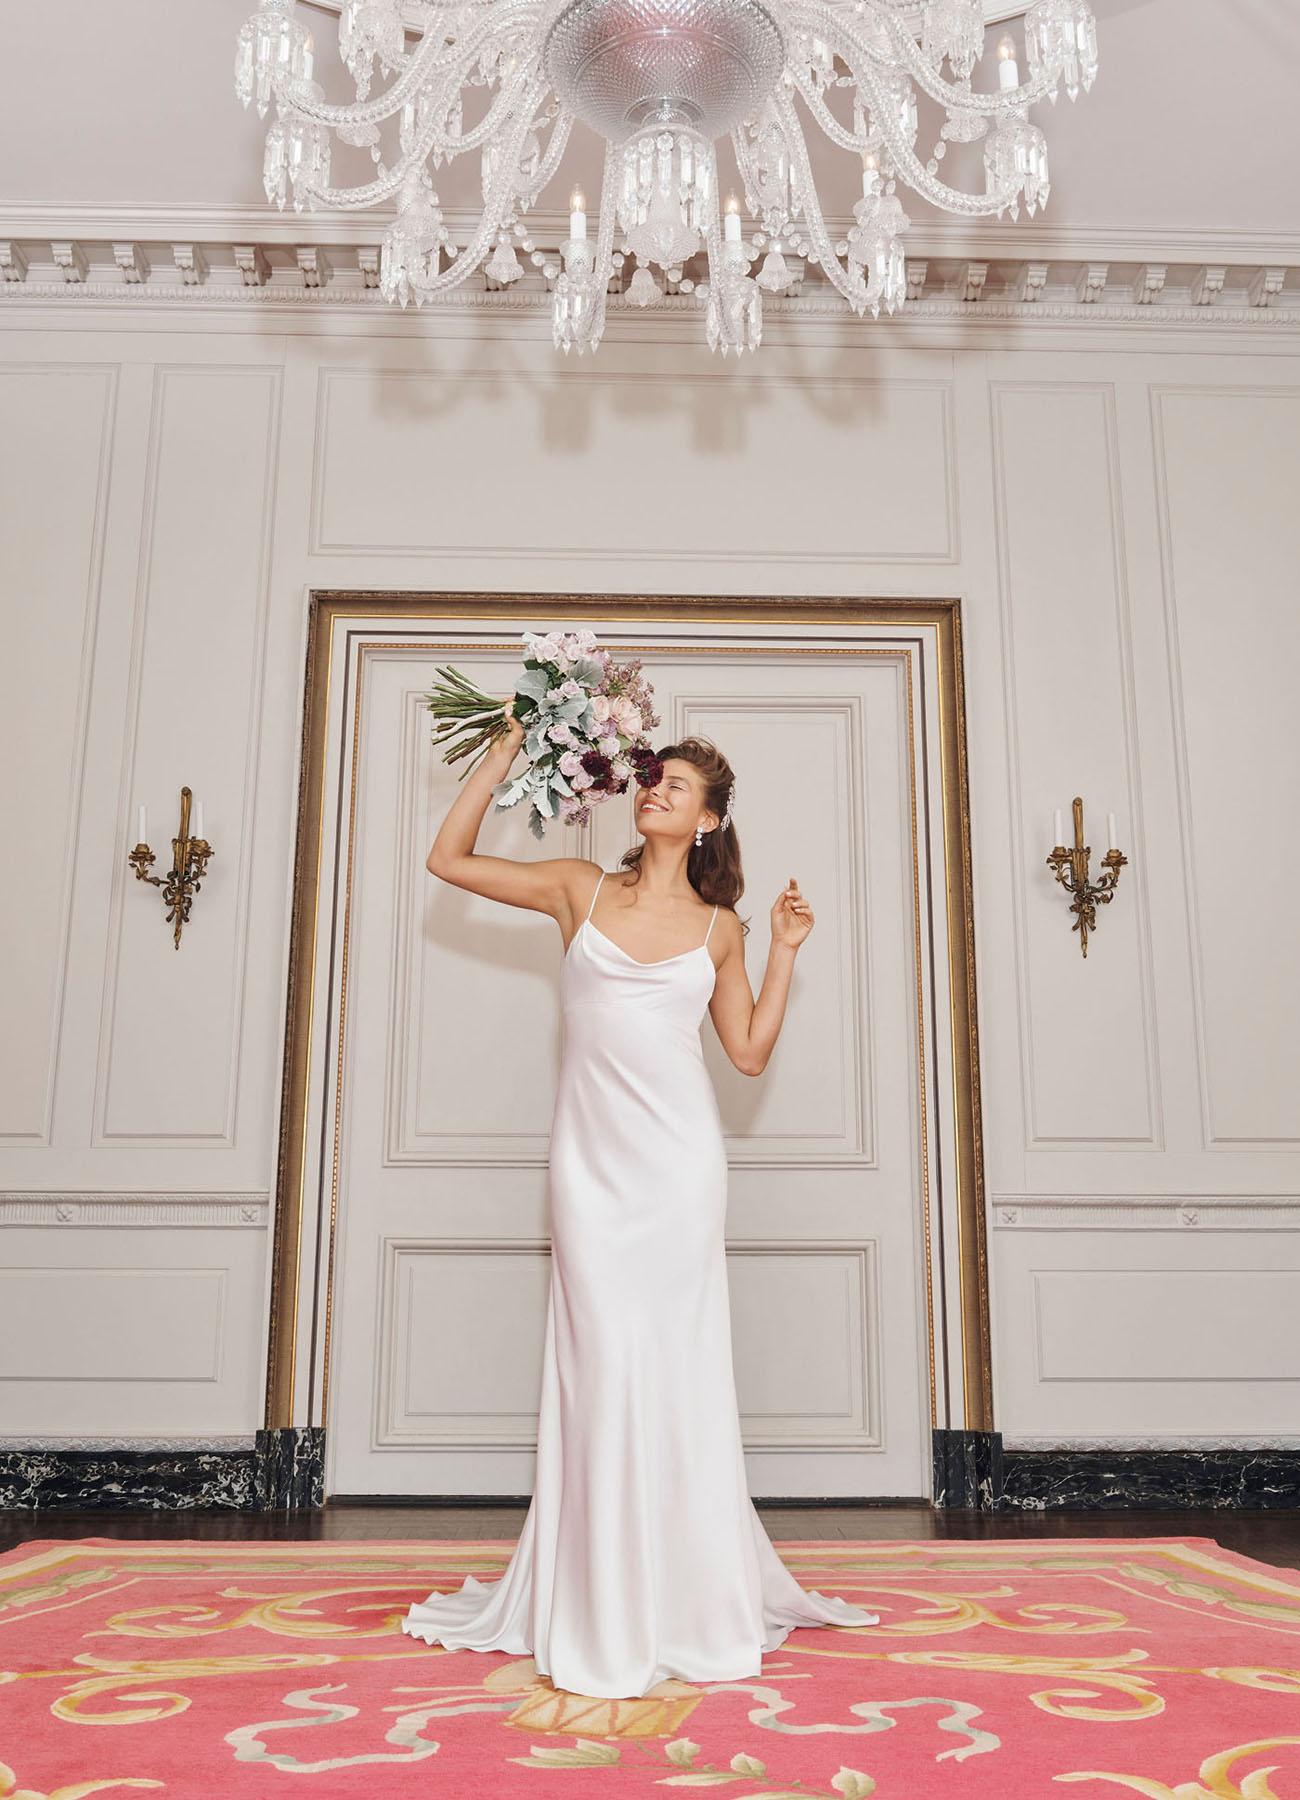 Bride wearing ivory slip wedding dress